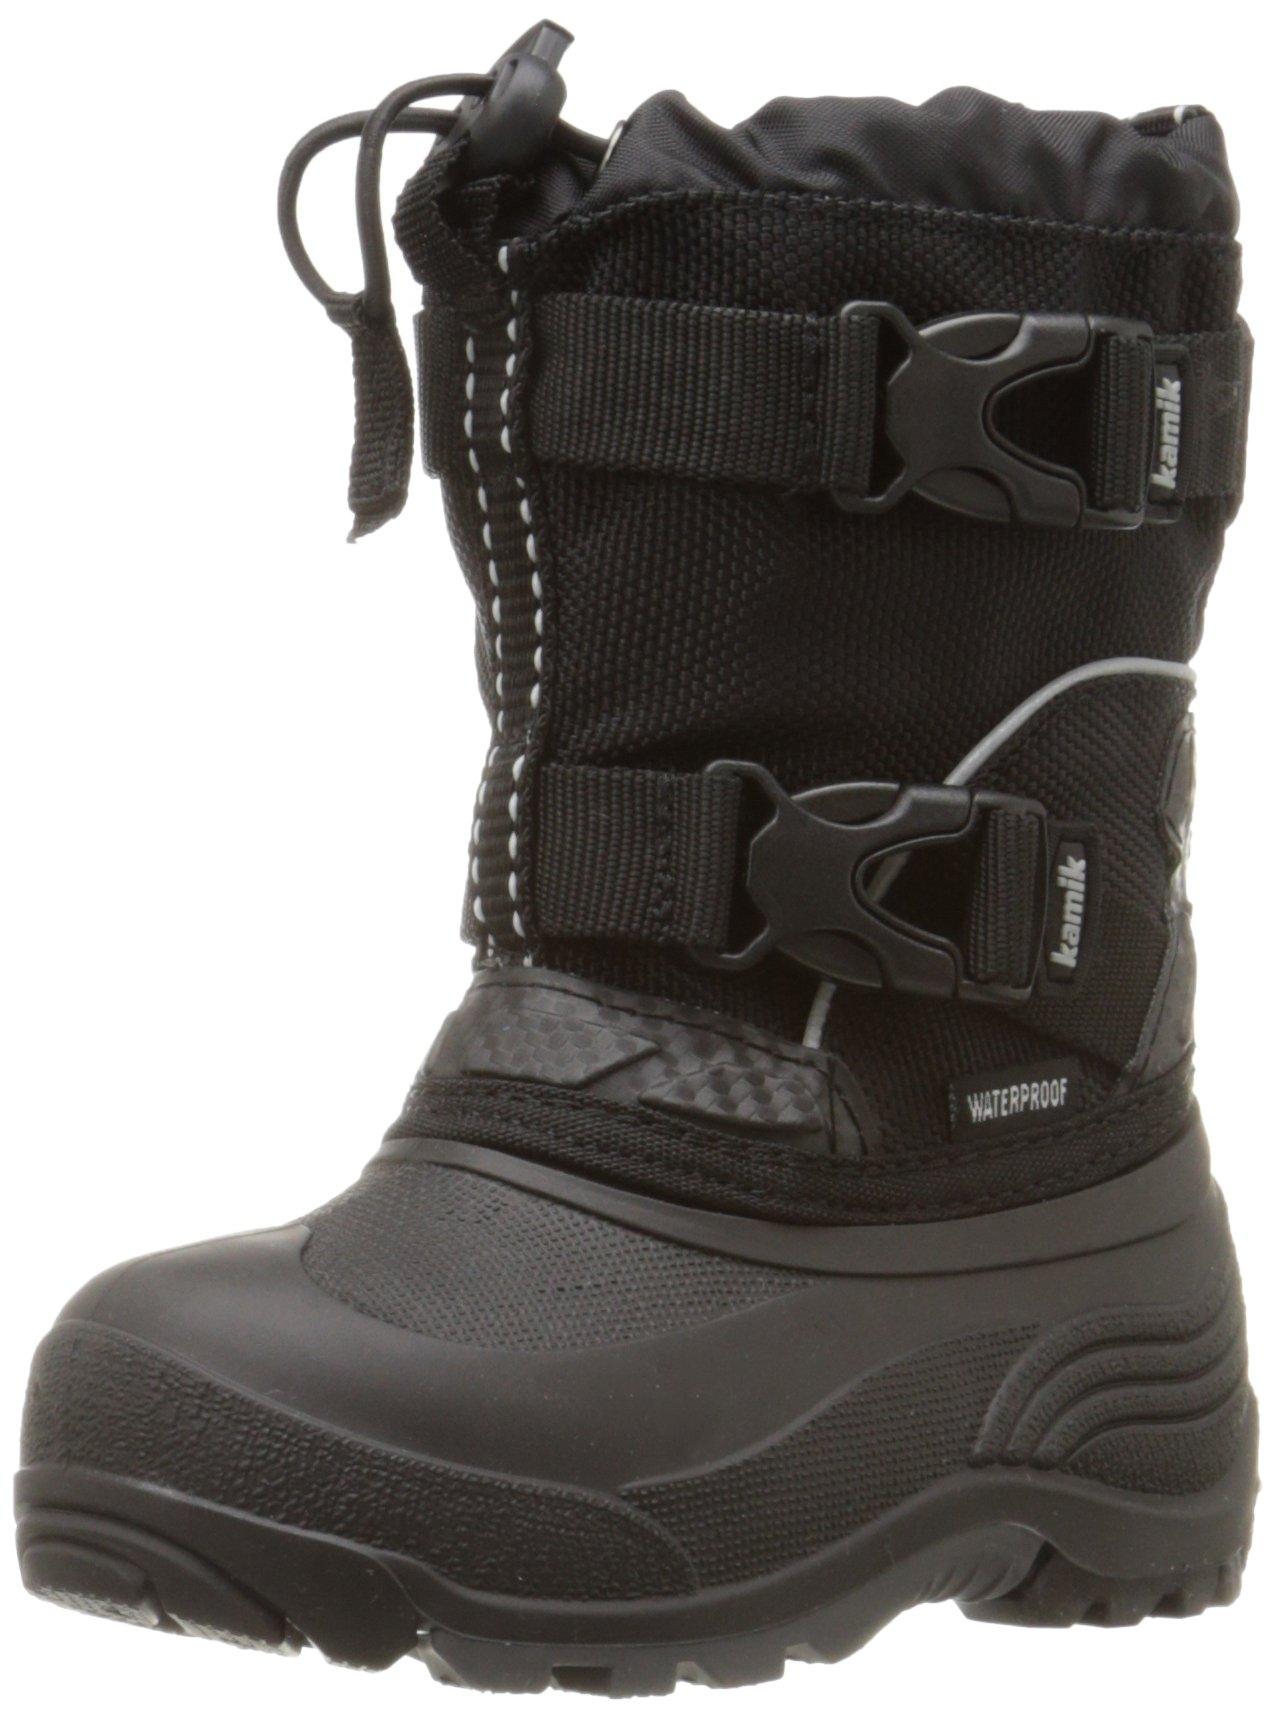 Kamik Glacial Snow Boot (Toddler/Little Kid/Big Kid), Black, 8 M US Toddler